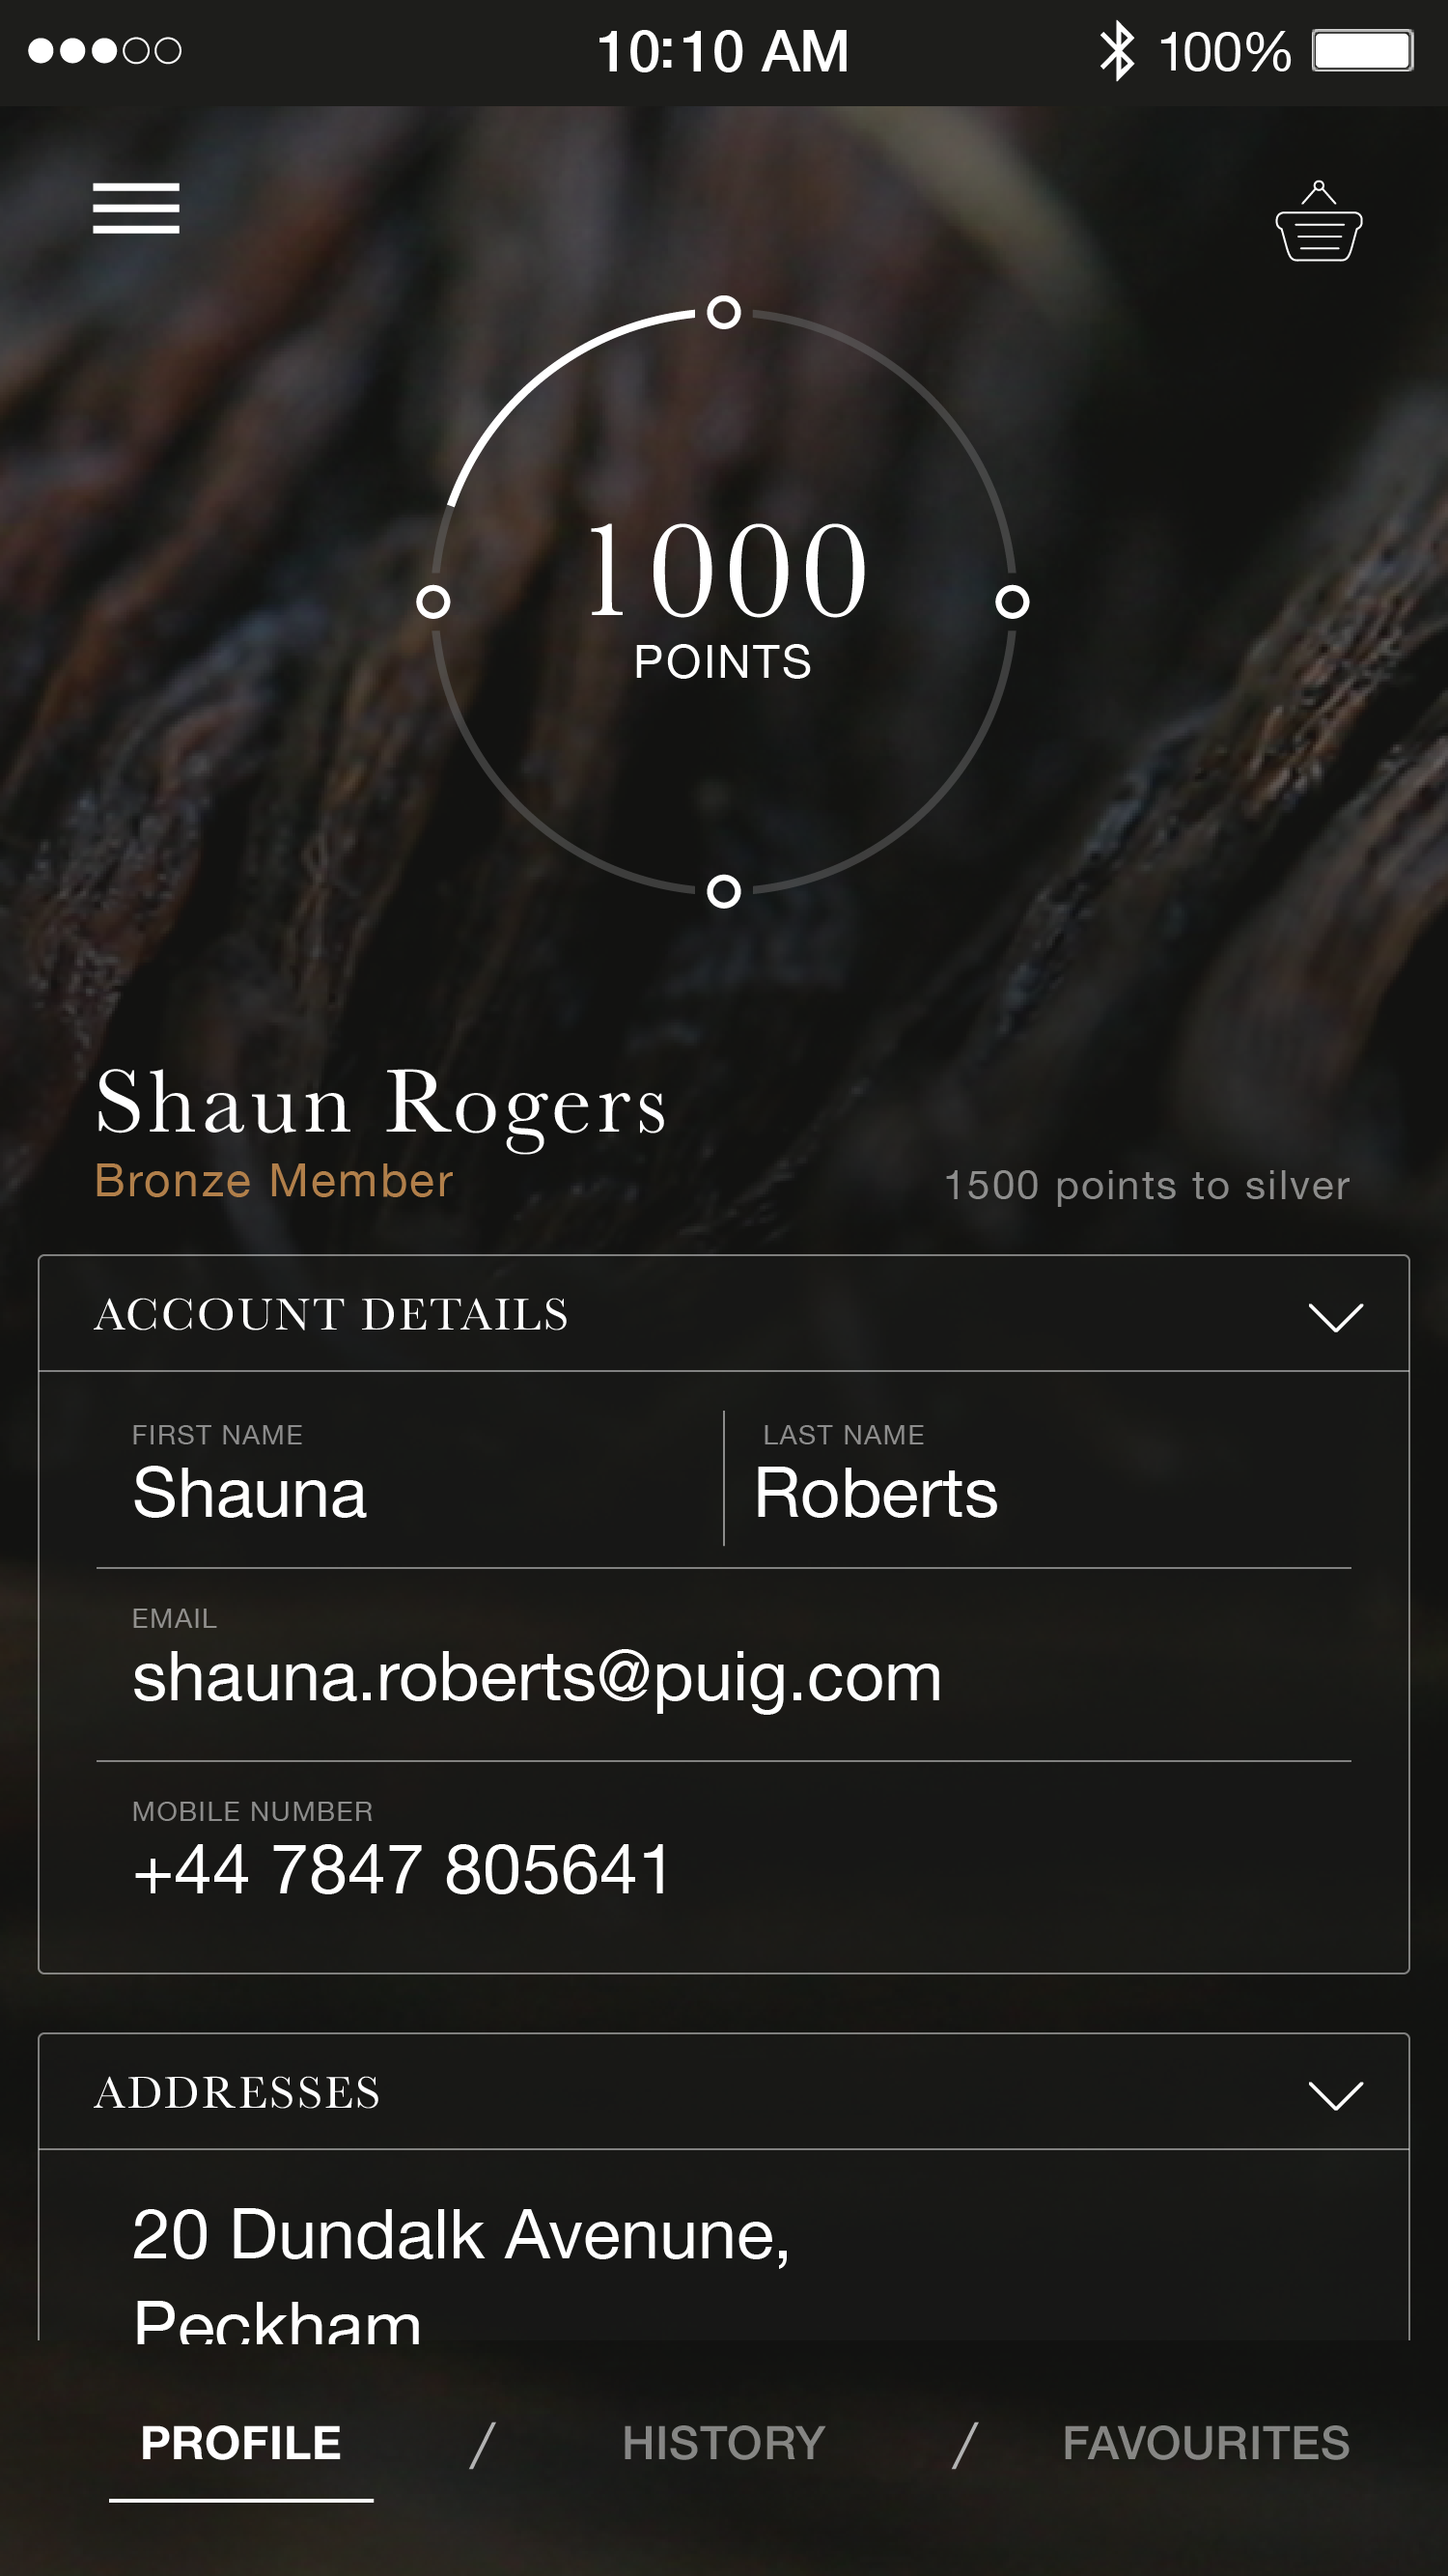 PUIG_11.AccountDetails